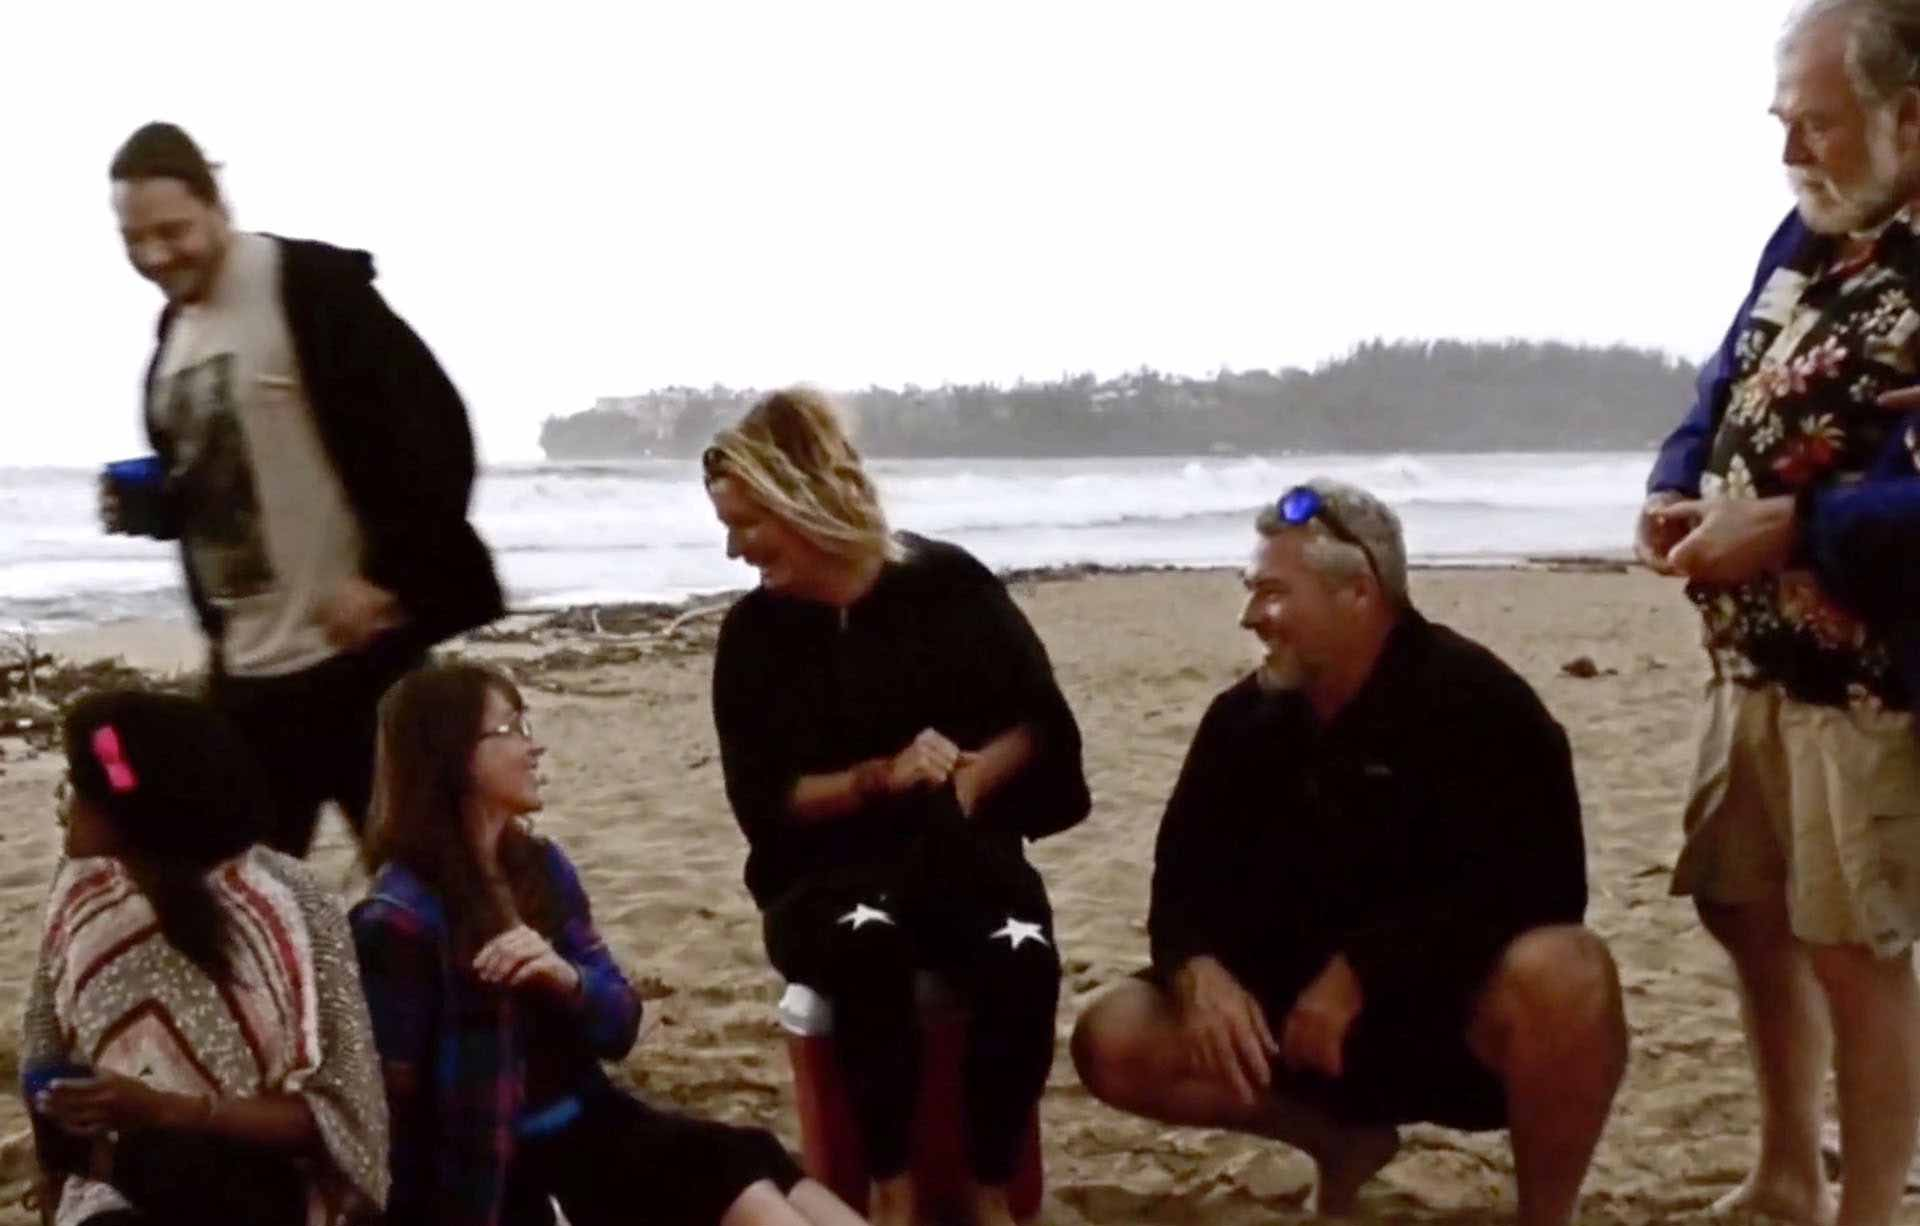 Kauai Nut Roasters owner at the beach